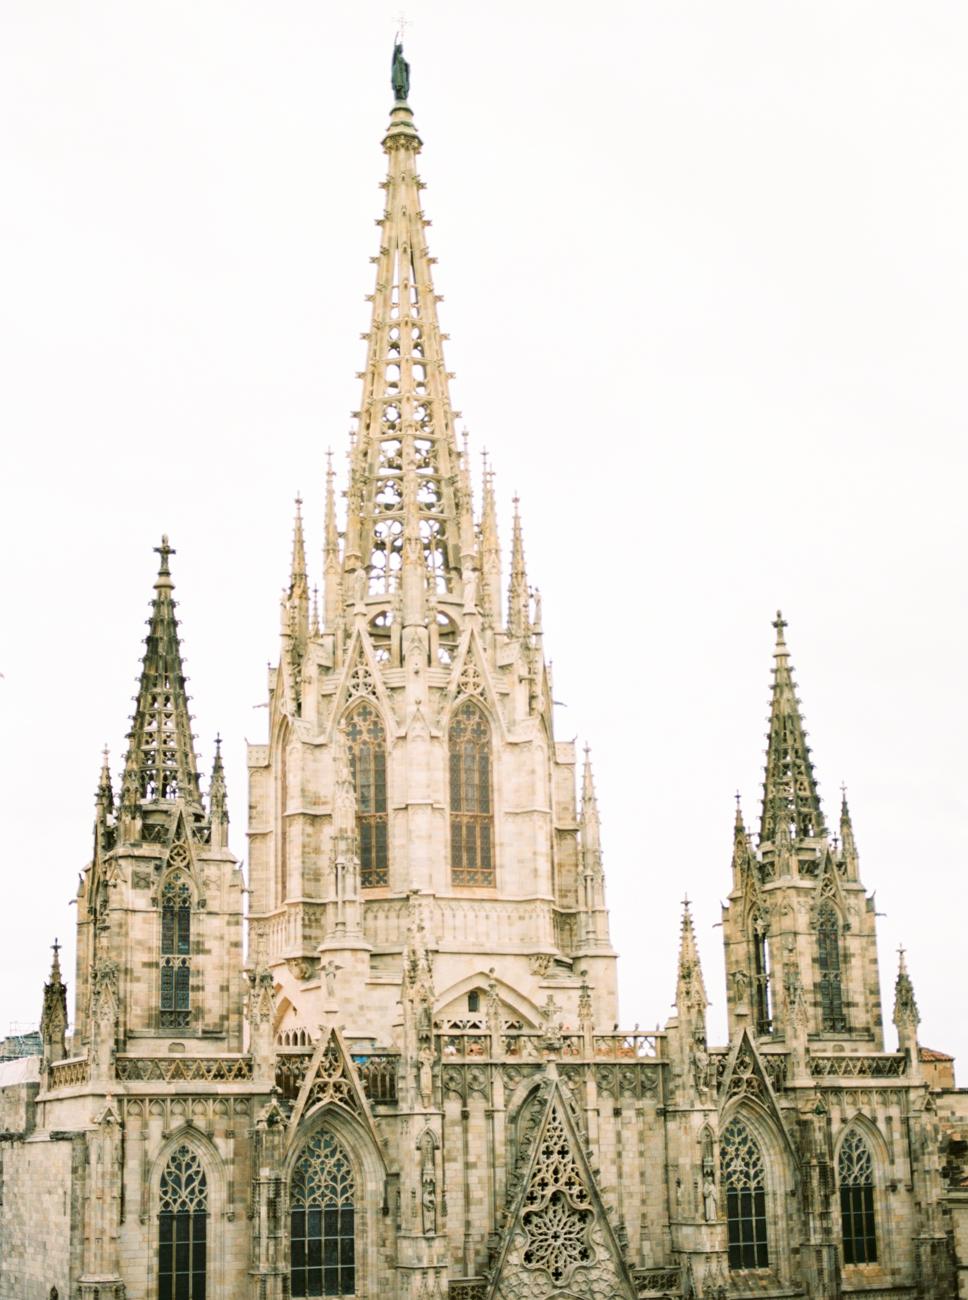 DennisRoyCoronel_travel_barcelona-1.jpg